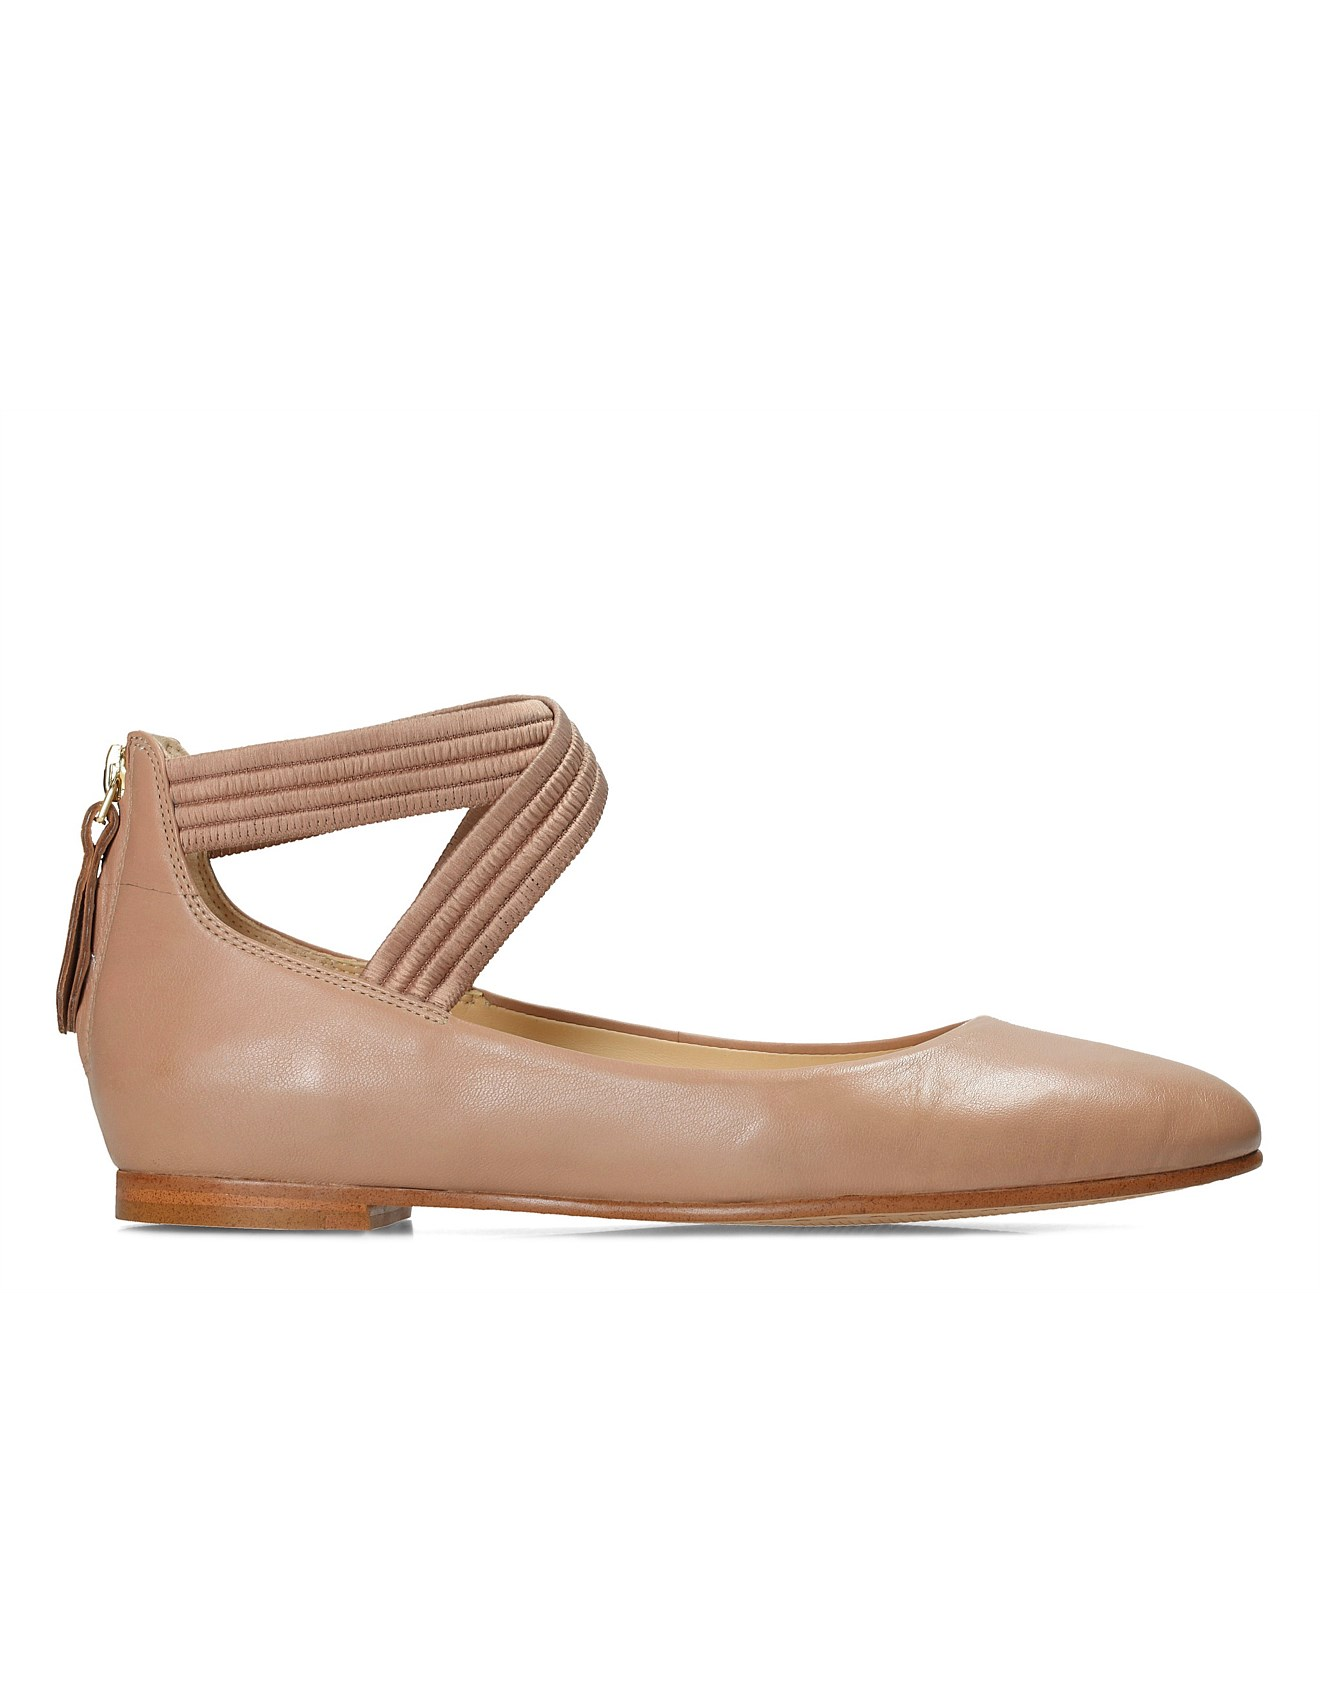 c4894c59271 Clarks   Buy Clarks Shoes & School Shoes Online   David Jones - GRACE ANNA